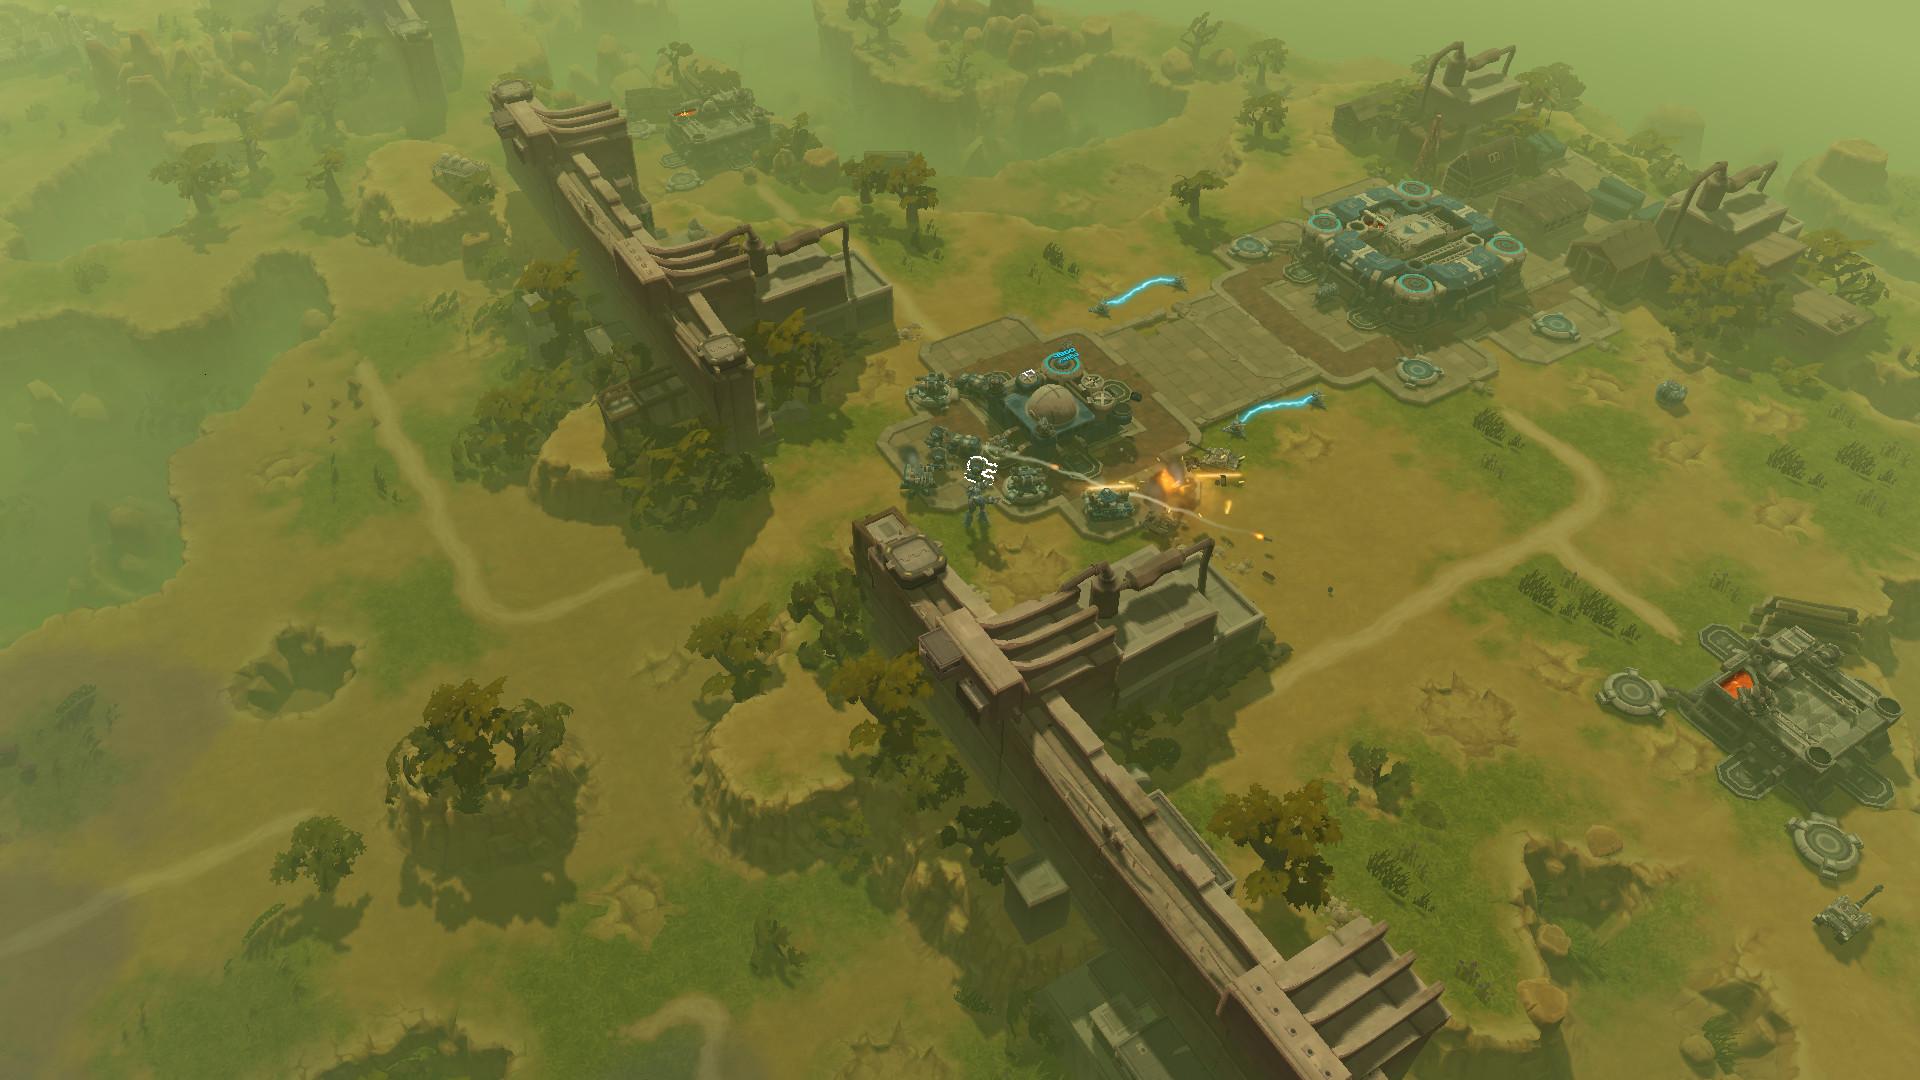 AirMech Wastelands je akční RPG s důrazem na strategické prvky 153279